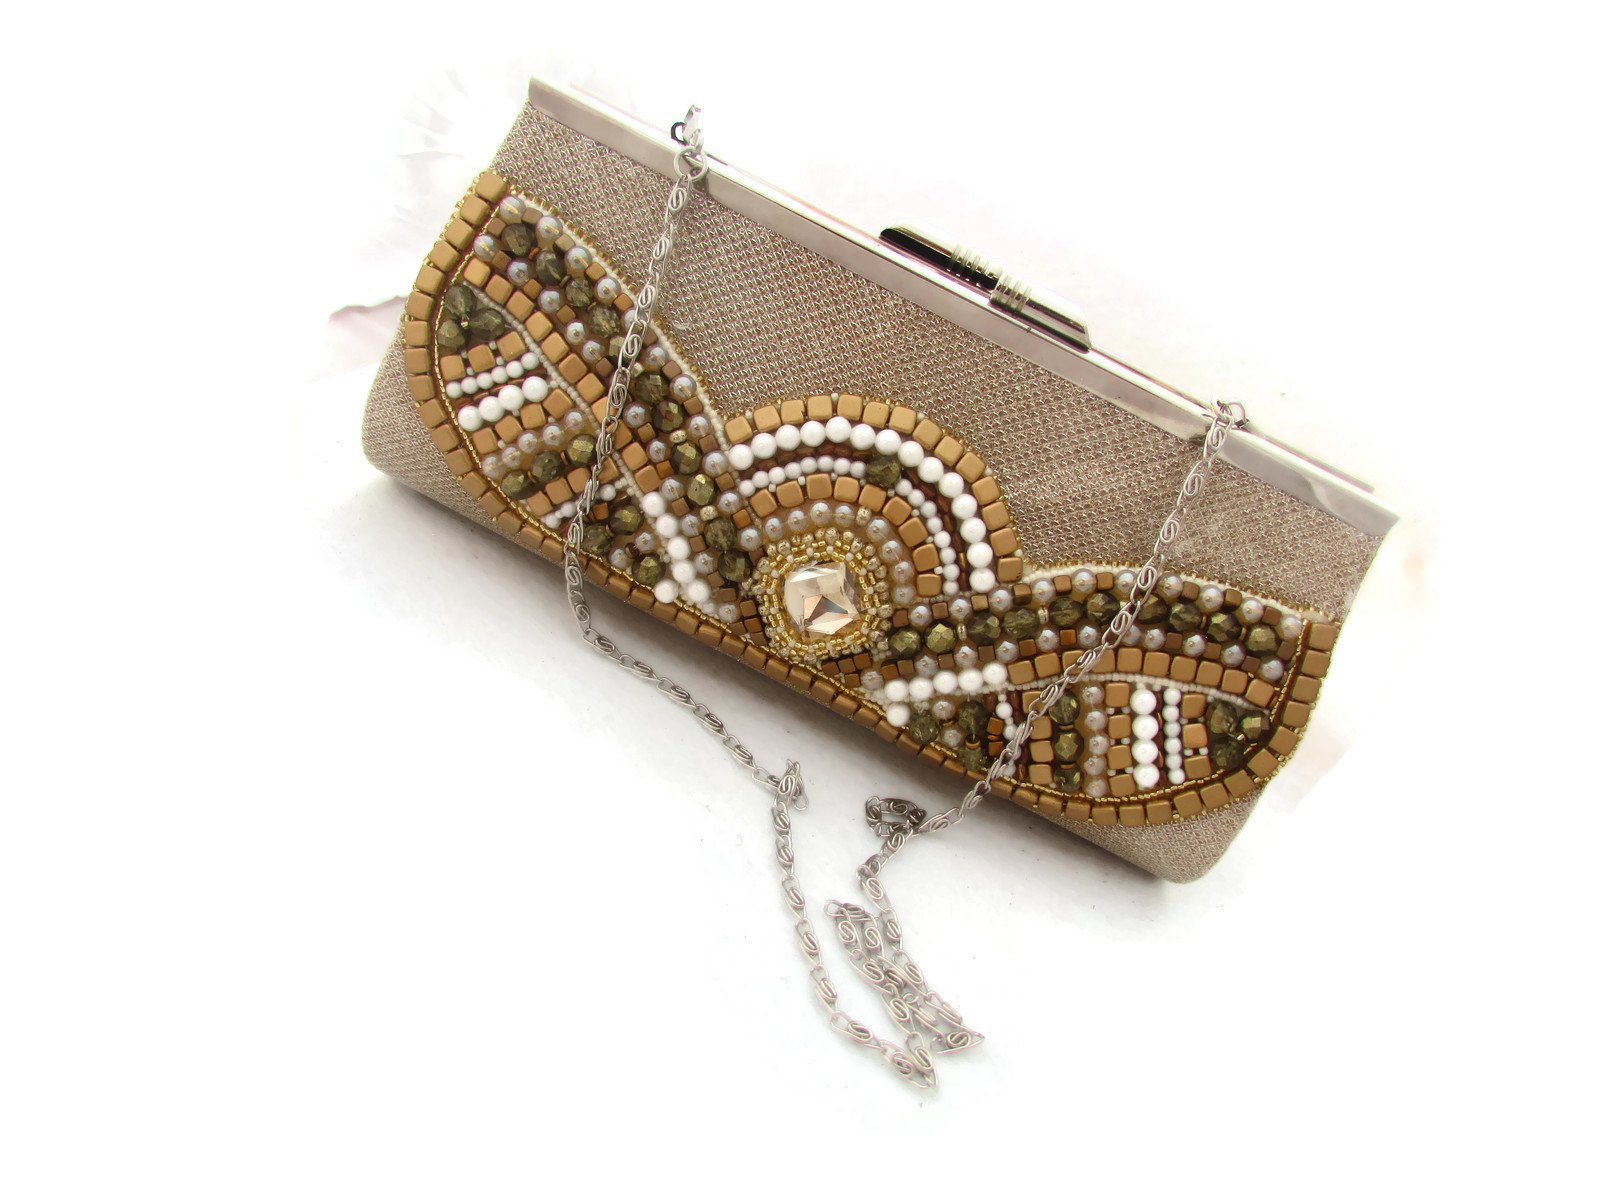 Original gold champagne handmade bead embroidered artisan jewelry purse handbag pouch clutch - Golden glory